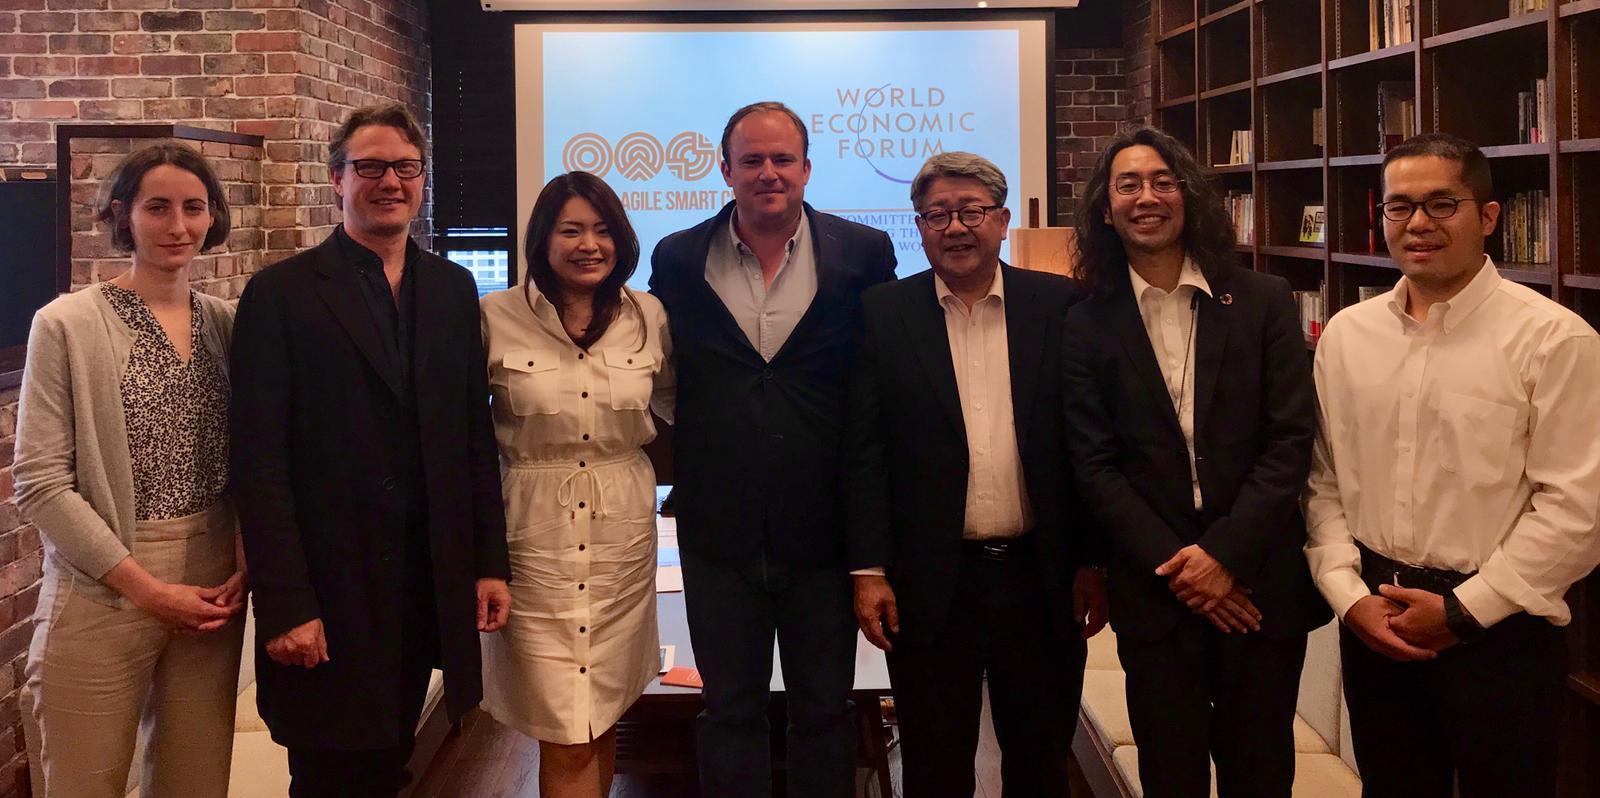 World Economic Forum and Open & Agile Smart Cities Announce Collaboration